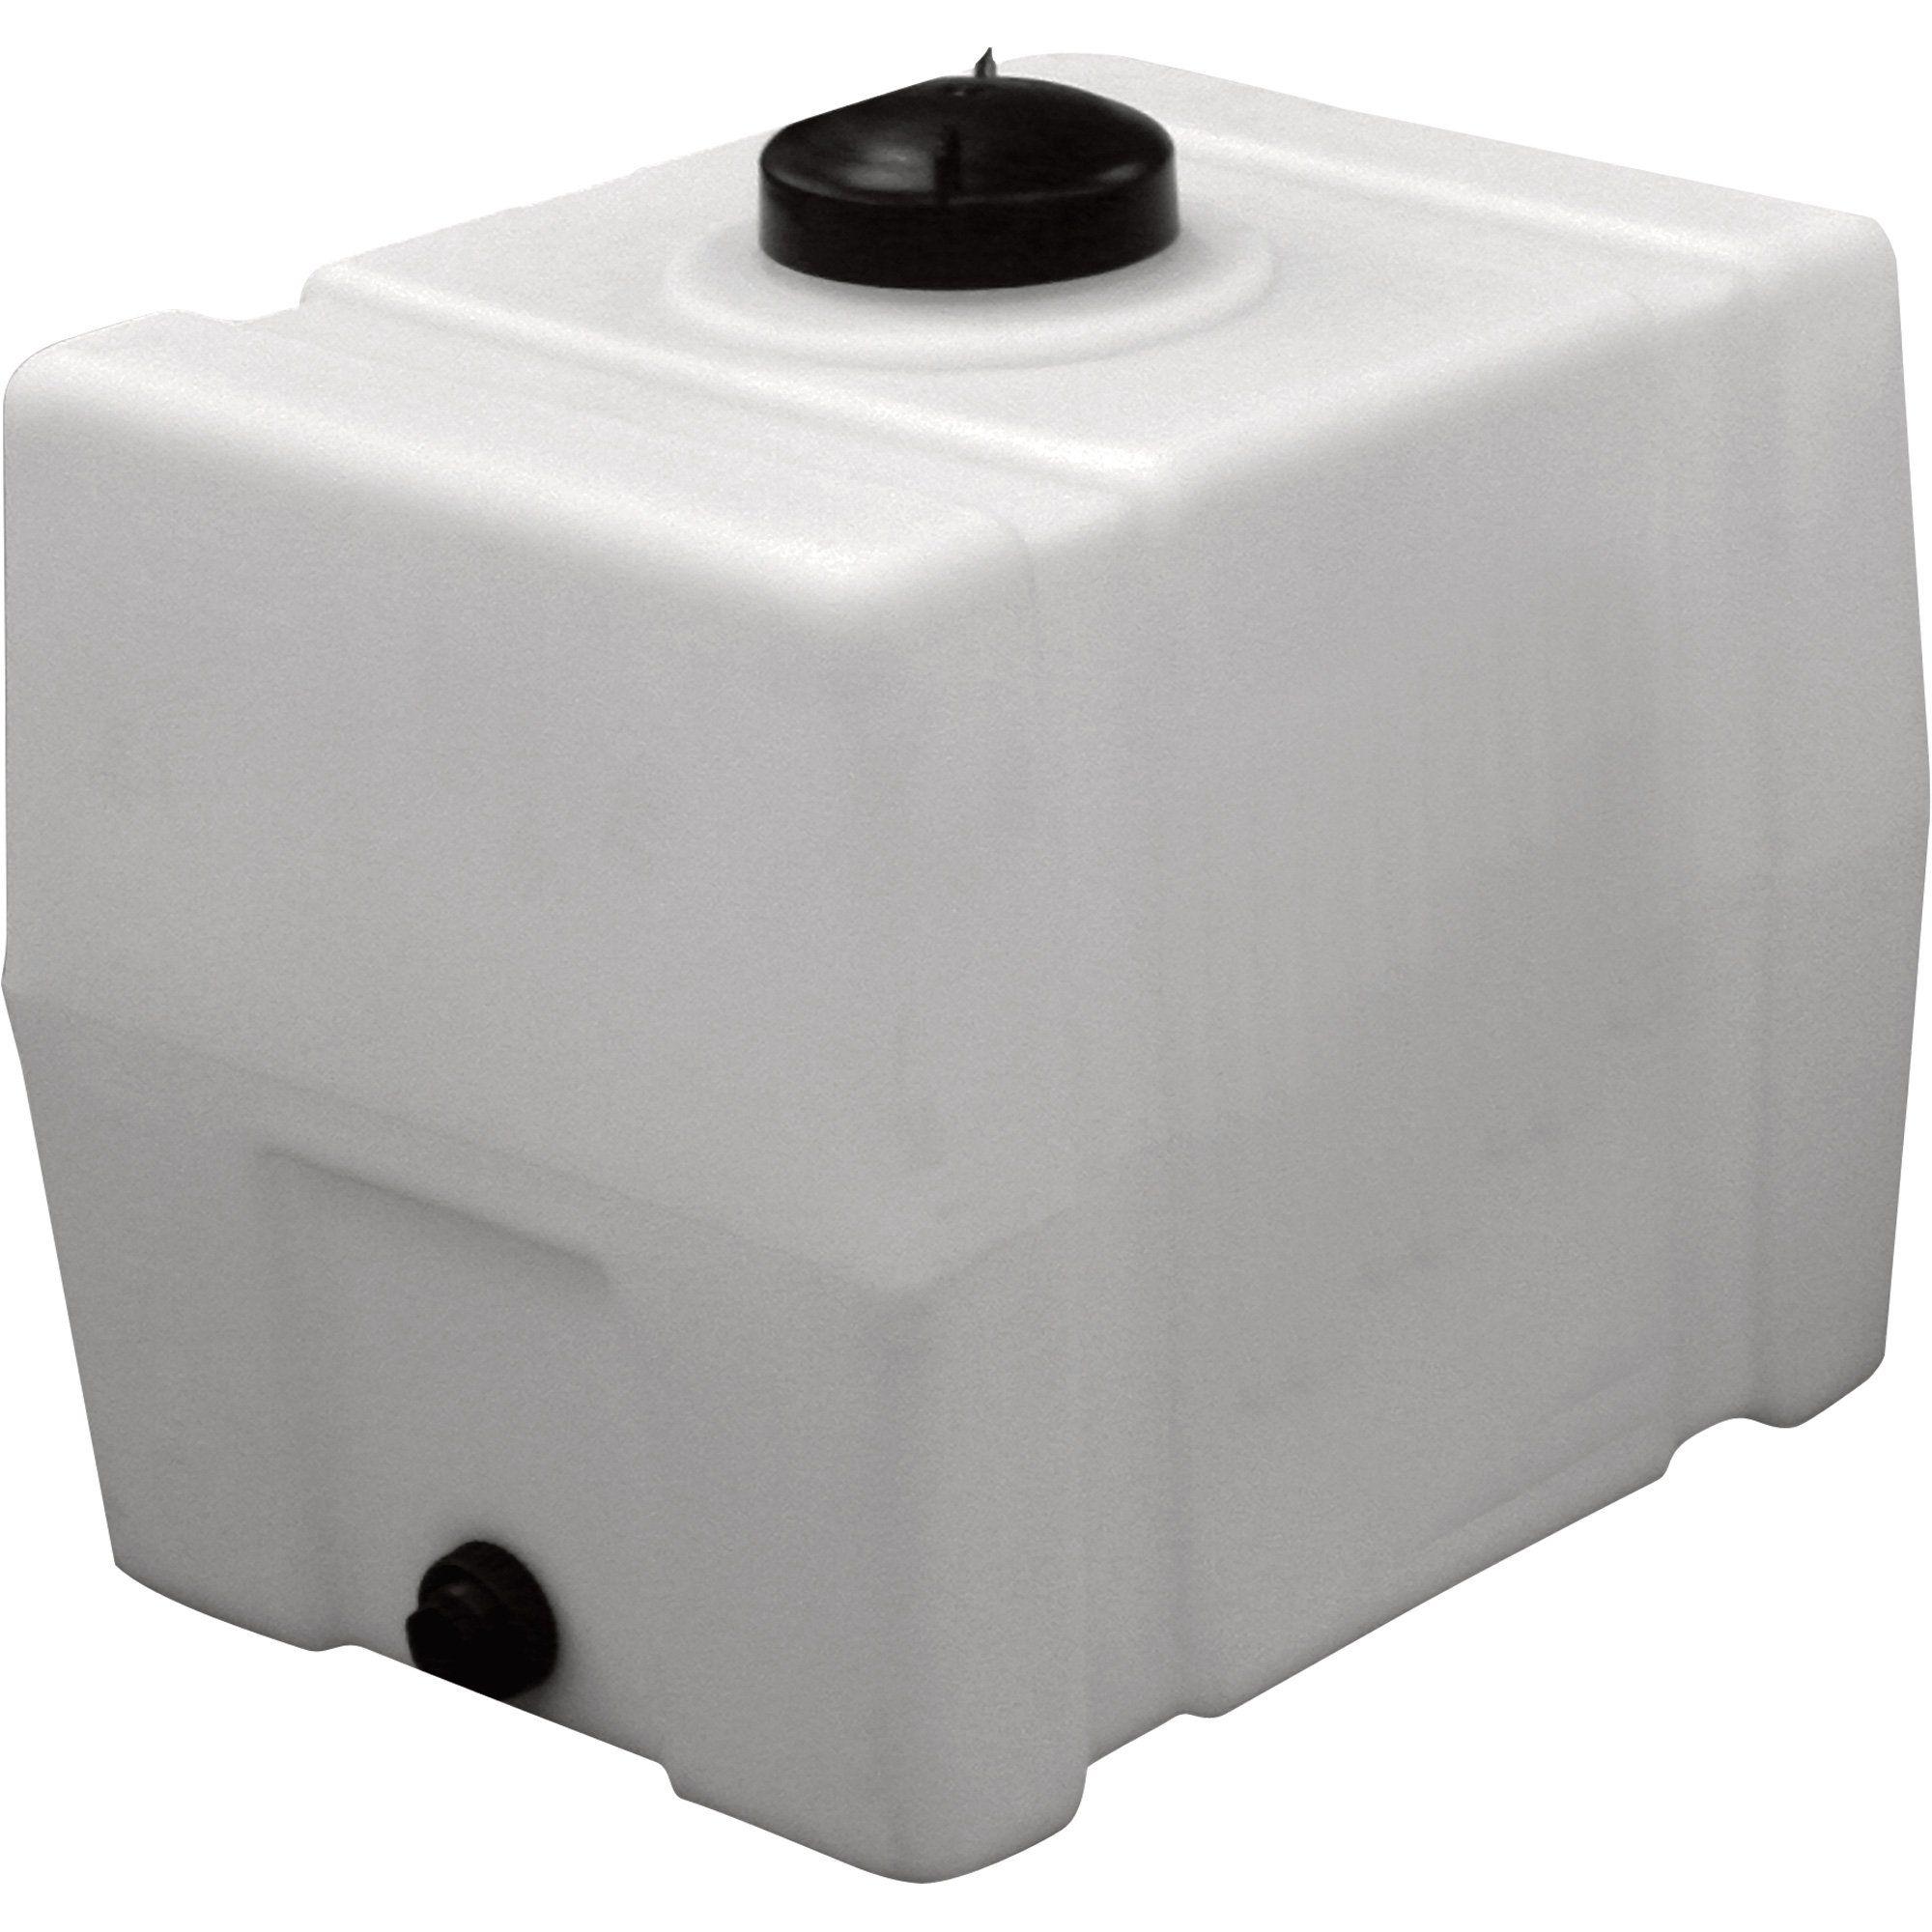 Romotech Poly Storage Tank Square 50 Gallon Capacity Model 2391 Storage Tank Storage Tanks Water Storage